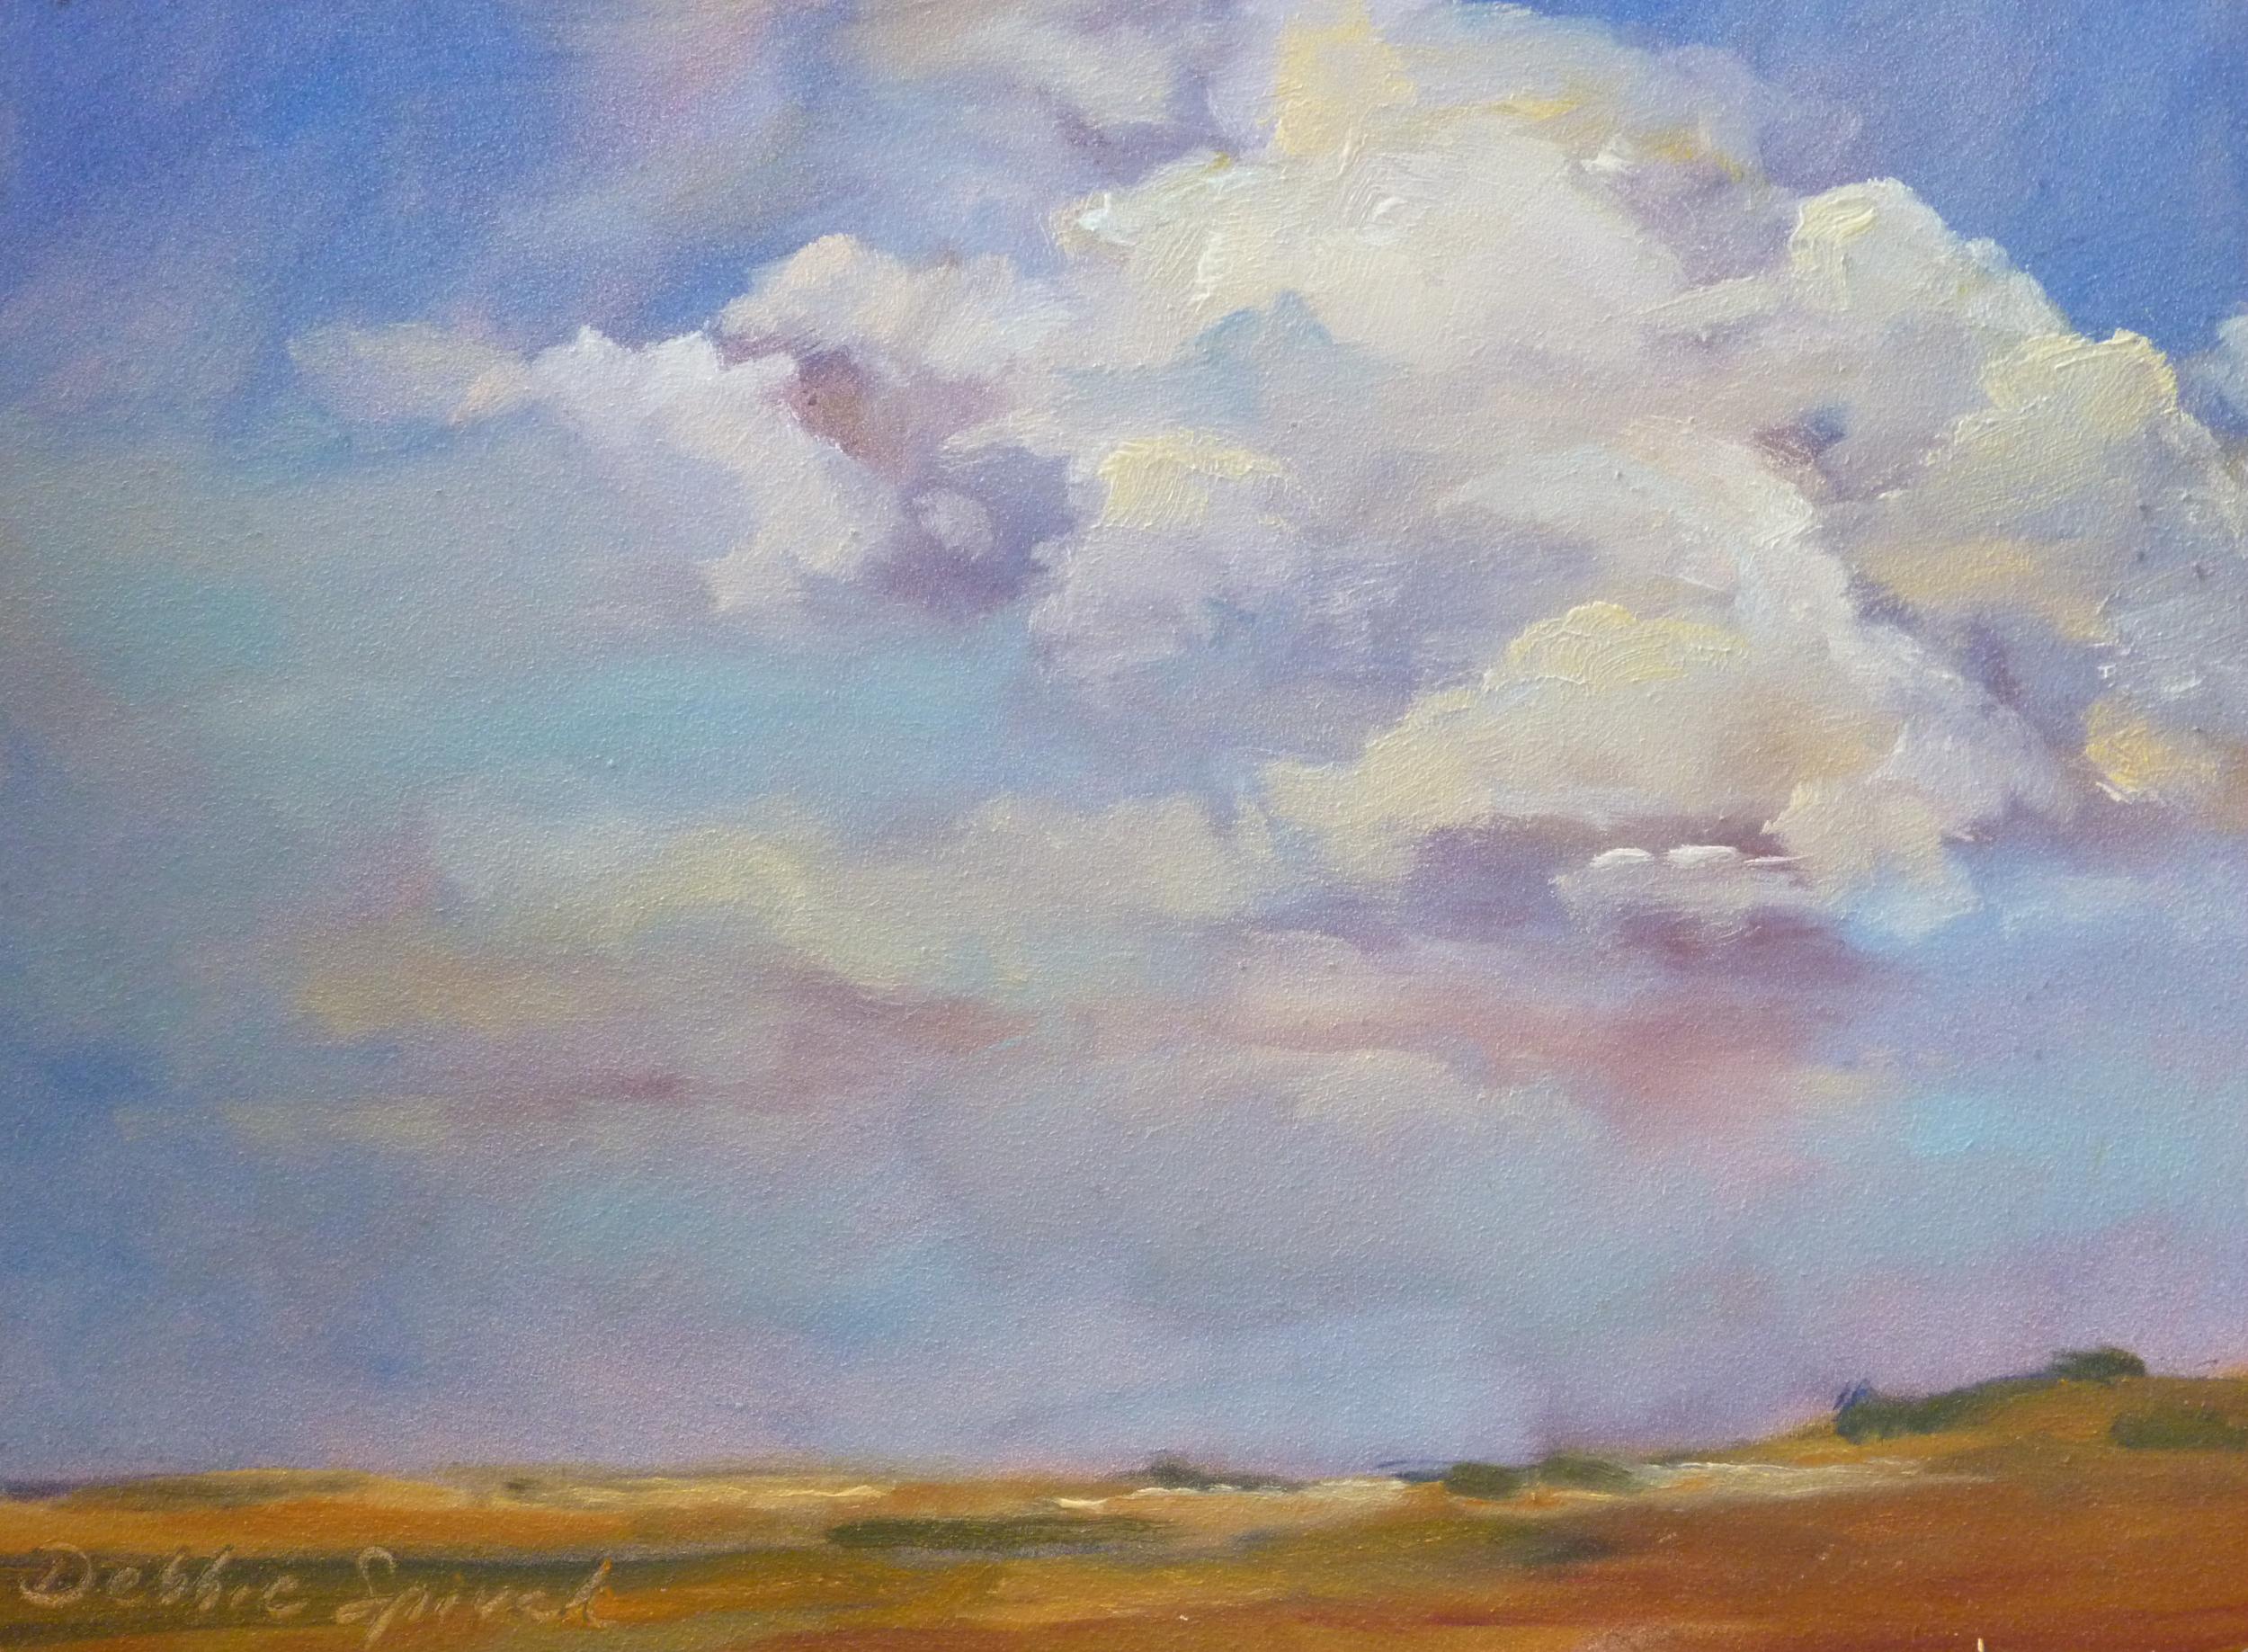 Prairie Sky - 9x12 oil